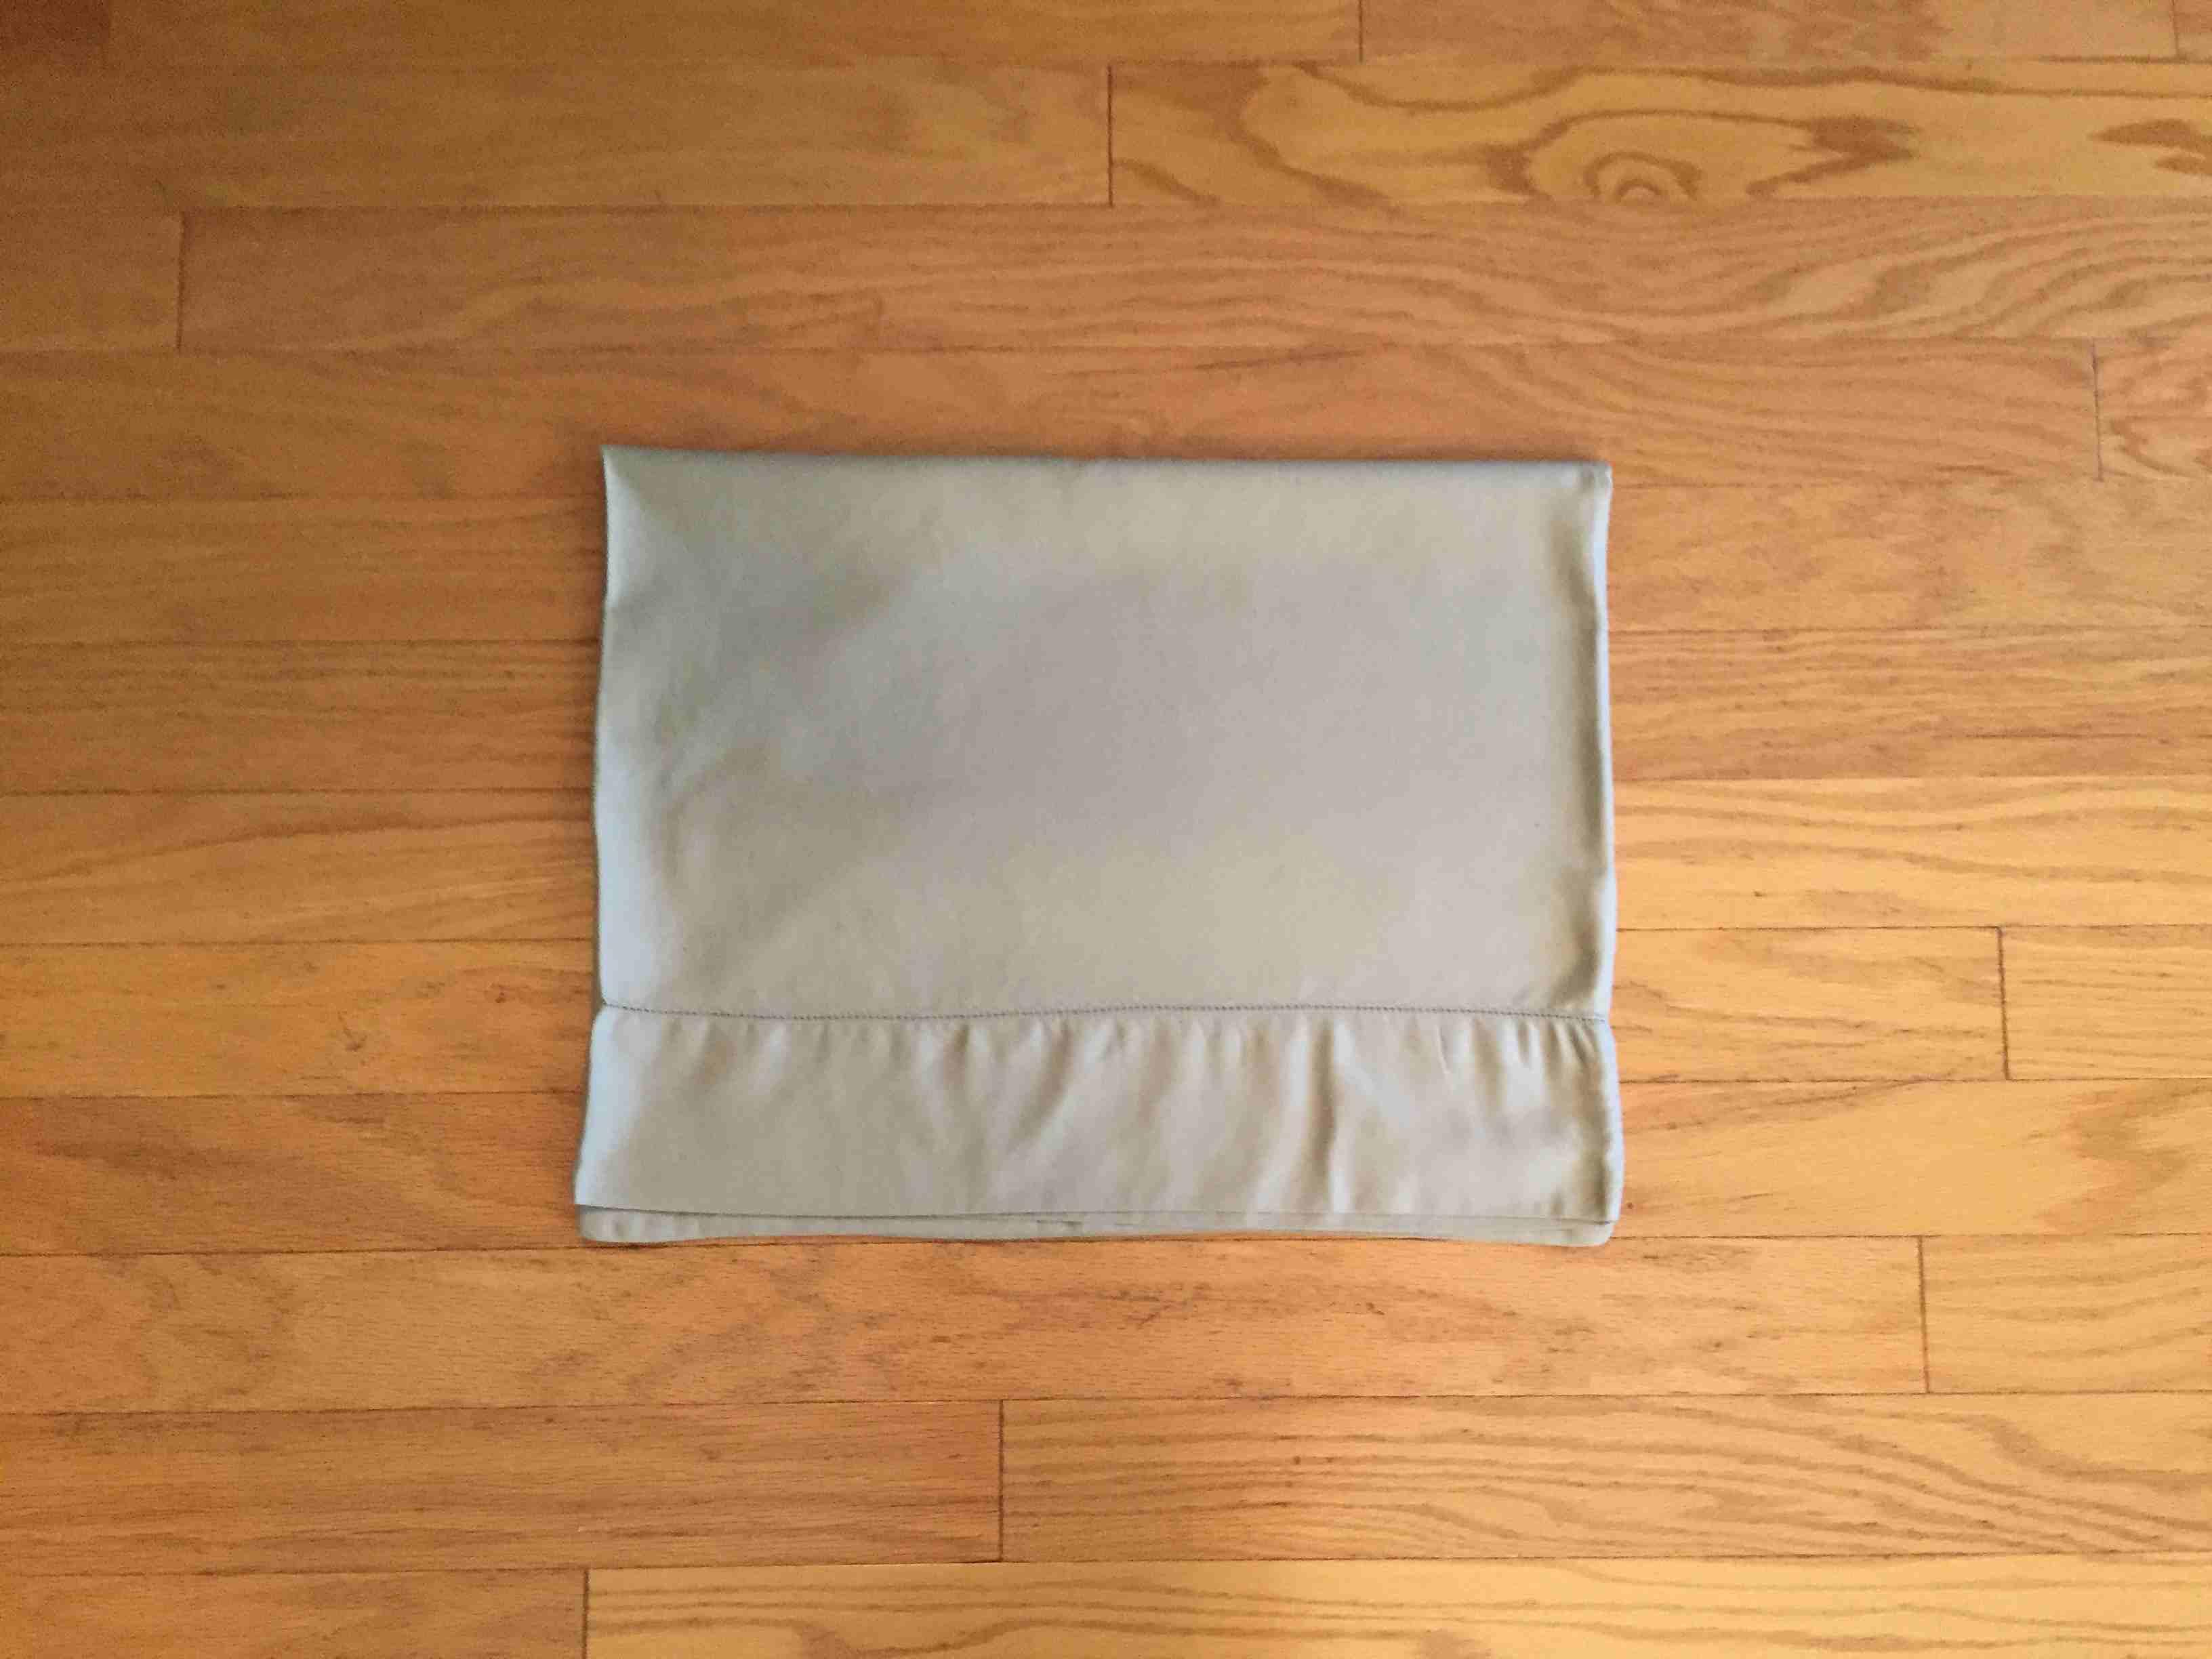 Duvet cover folded in half